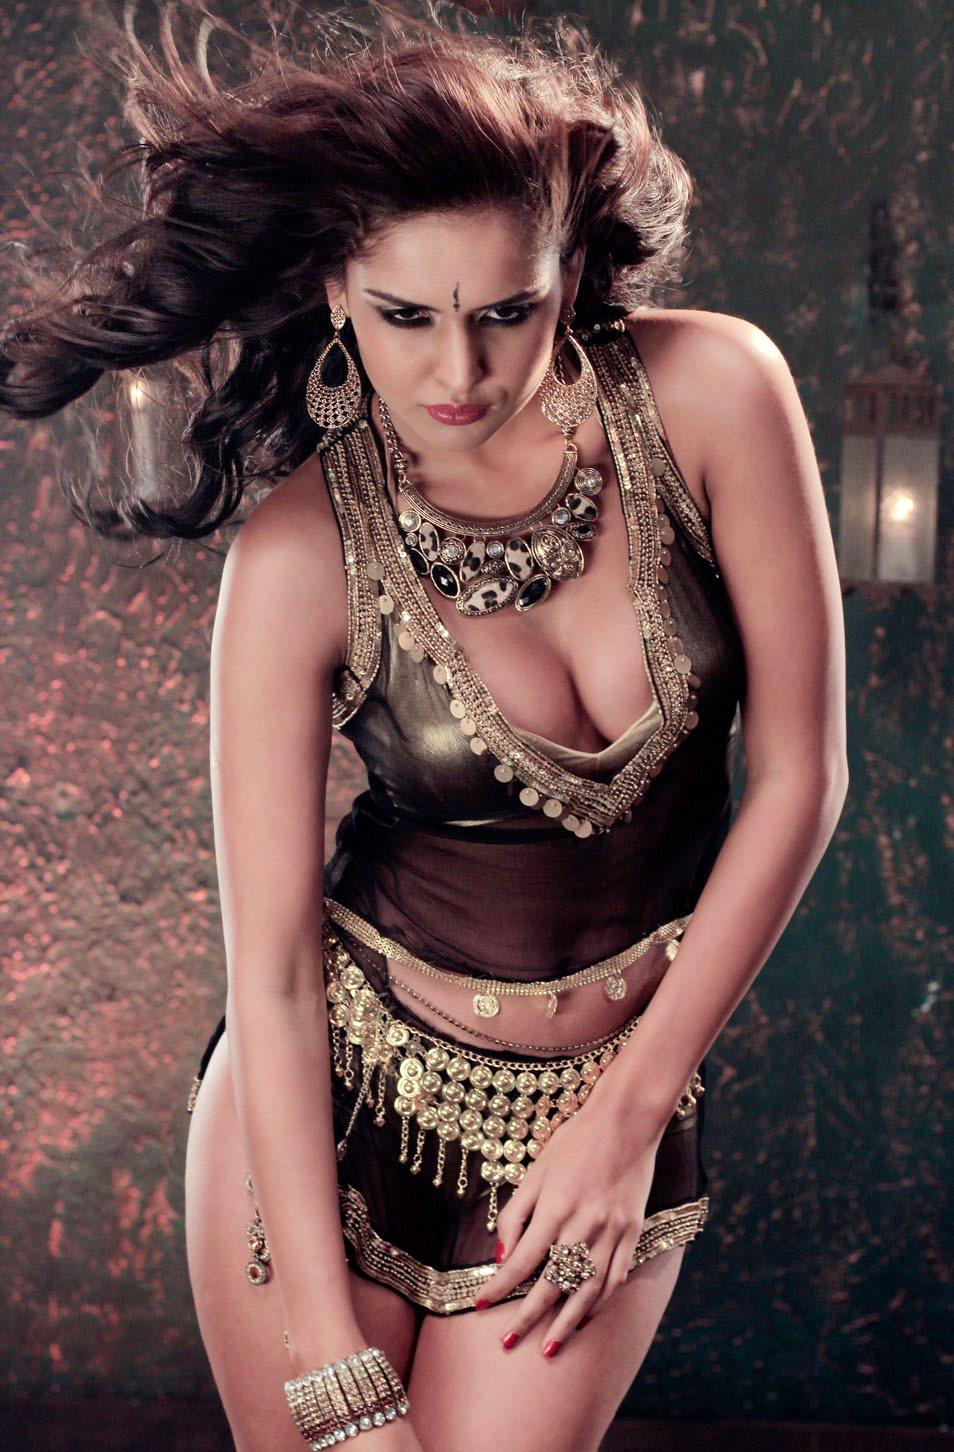 nathalia kaur hot photoshoot in gold and black dress 25cineframes. Black Bedroom Furniture Sets. Home Design Ideas